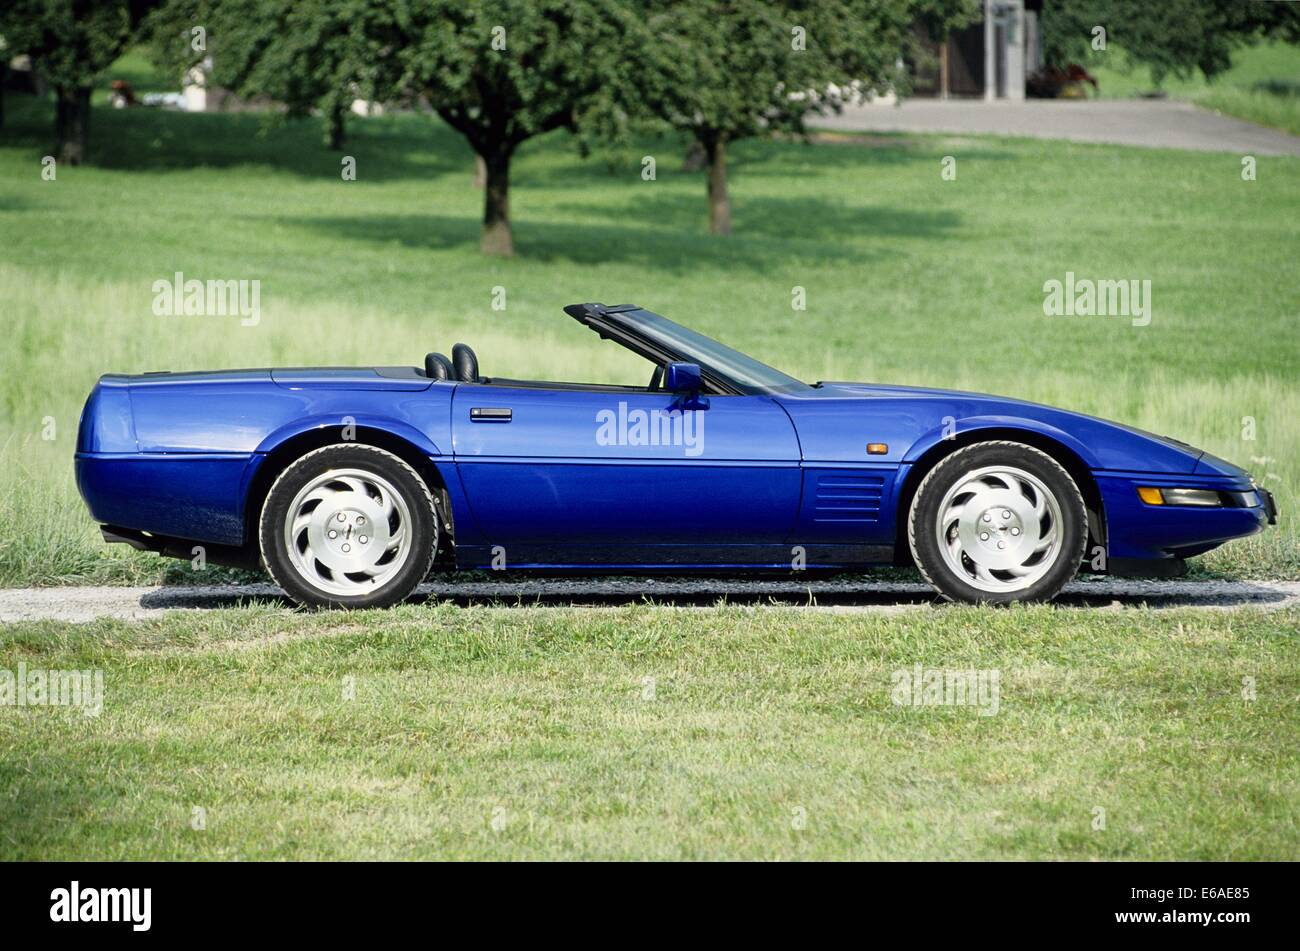 Chevrolet Corvette C4 fourth generation - 1994 Model Year in blue